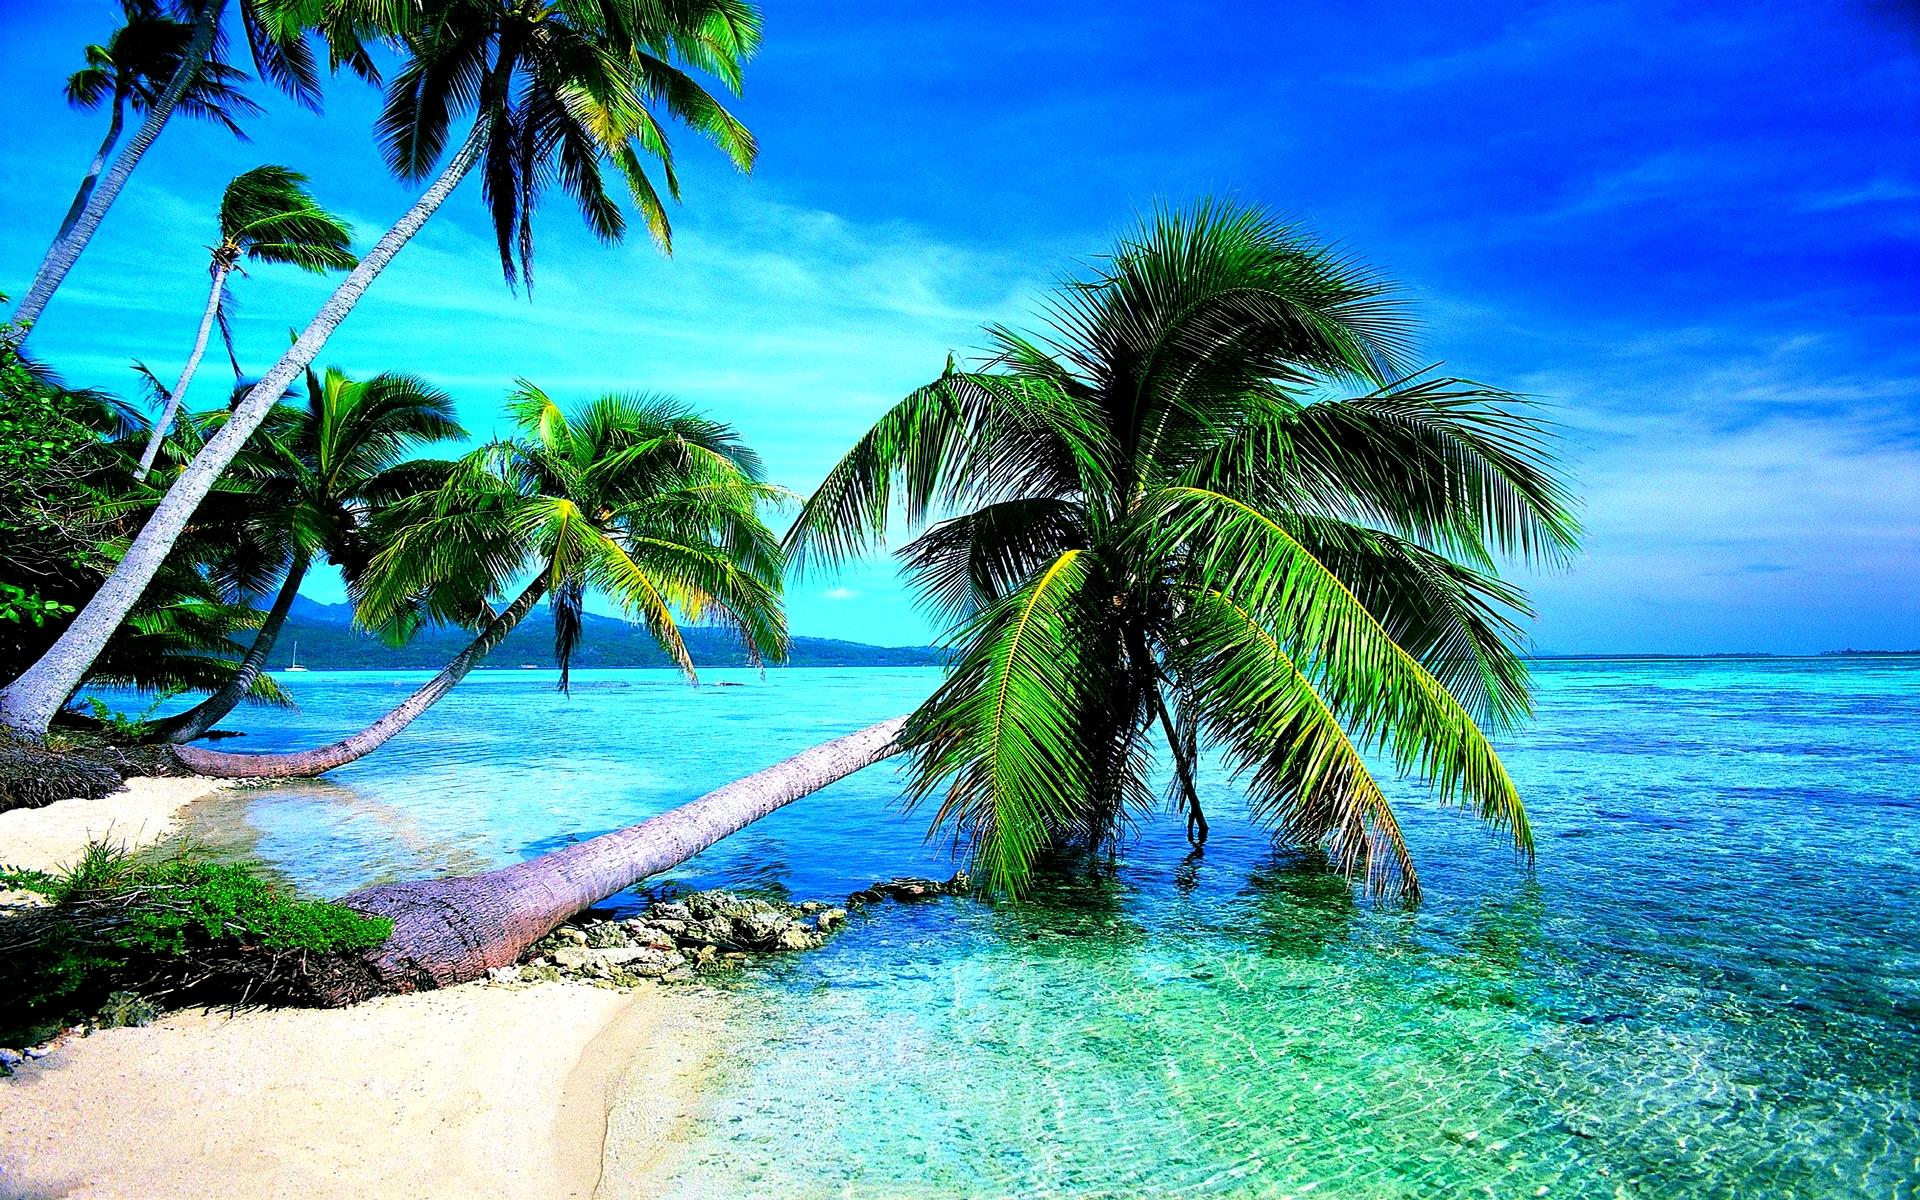 Top 20 Tropical Beach Hd Wallpapers 1920x1200